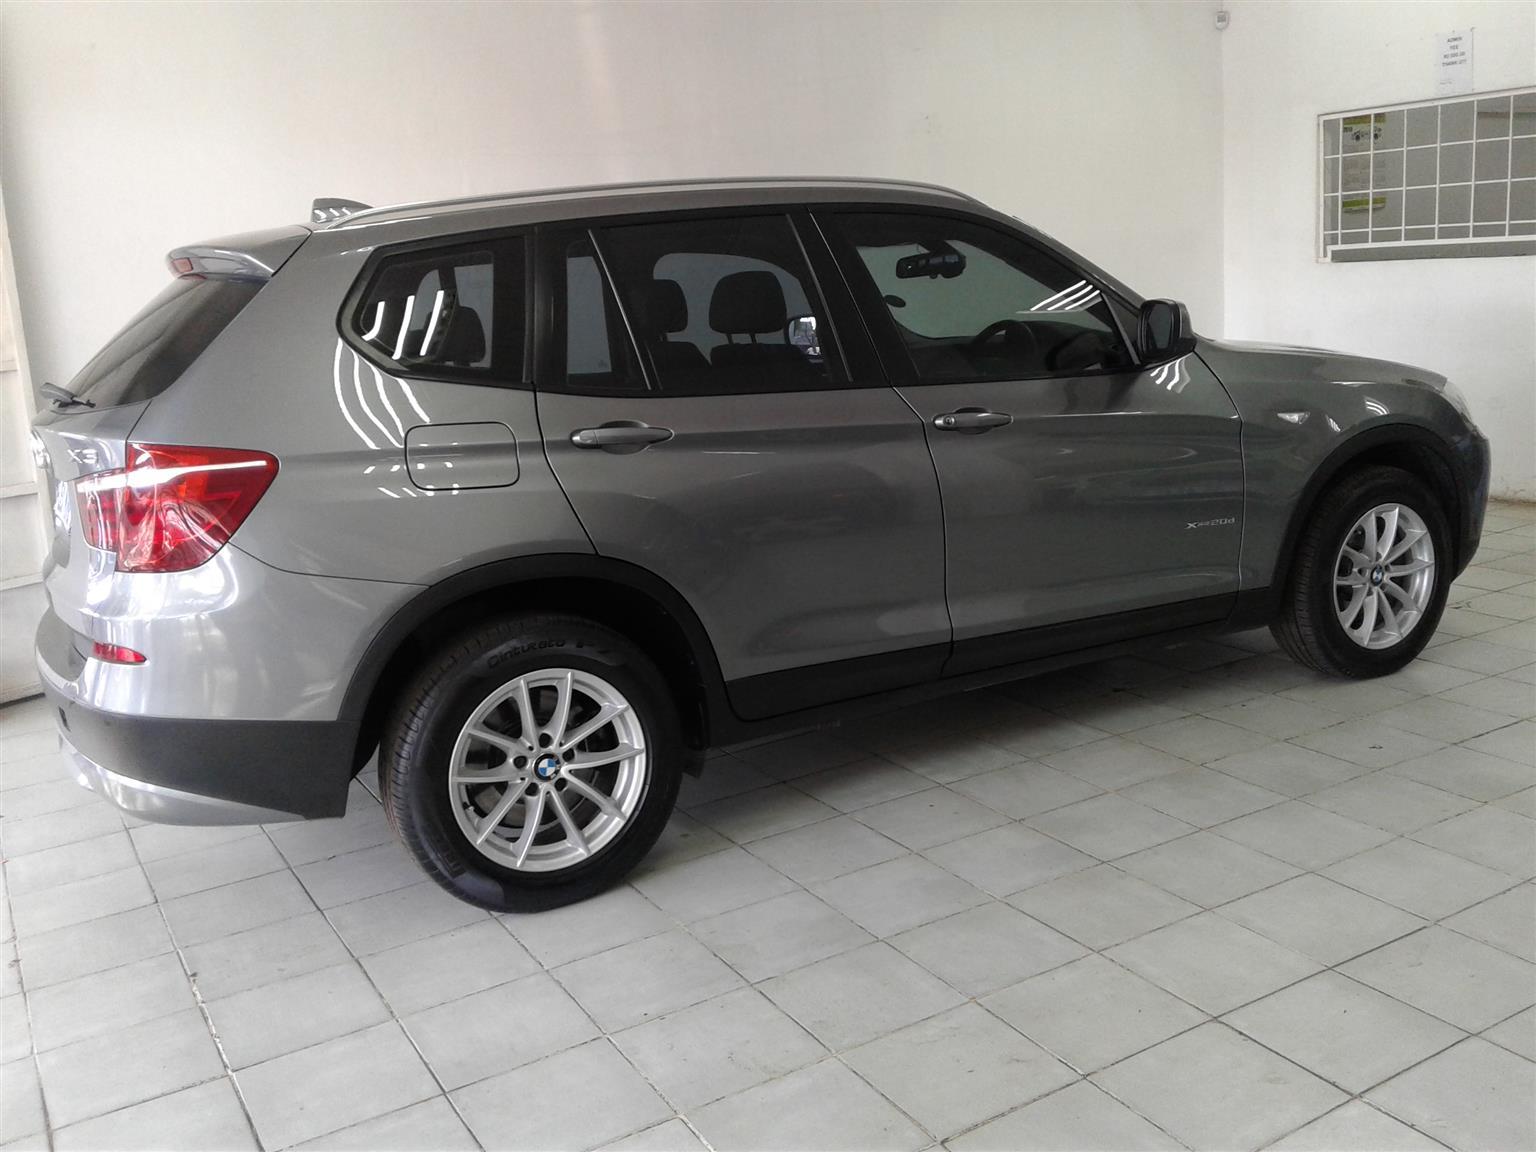 2012 BMW X3 xDrive20d auto